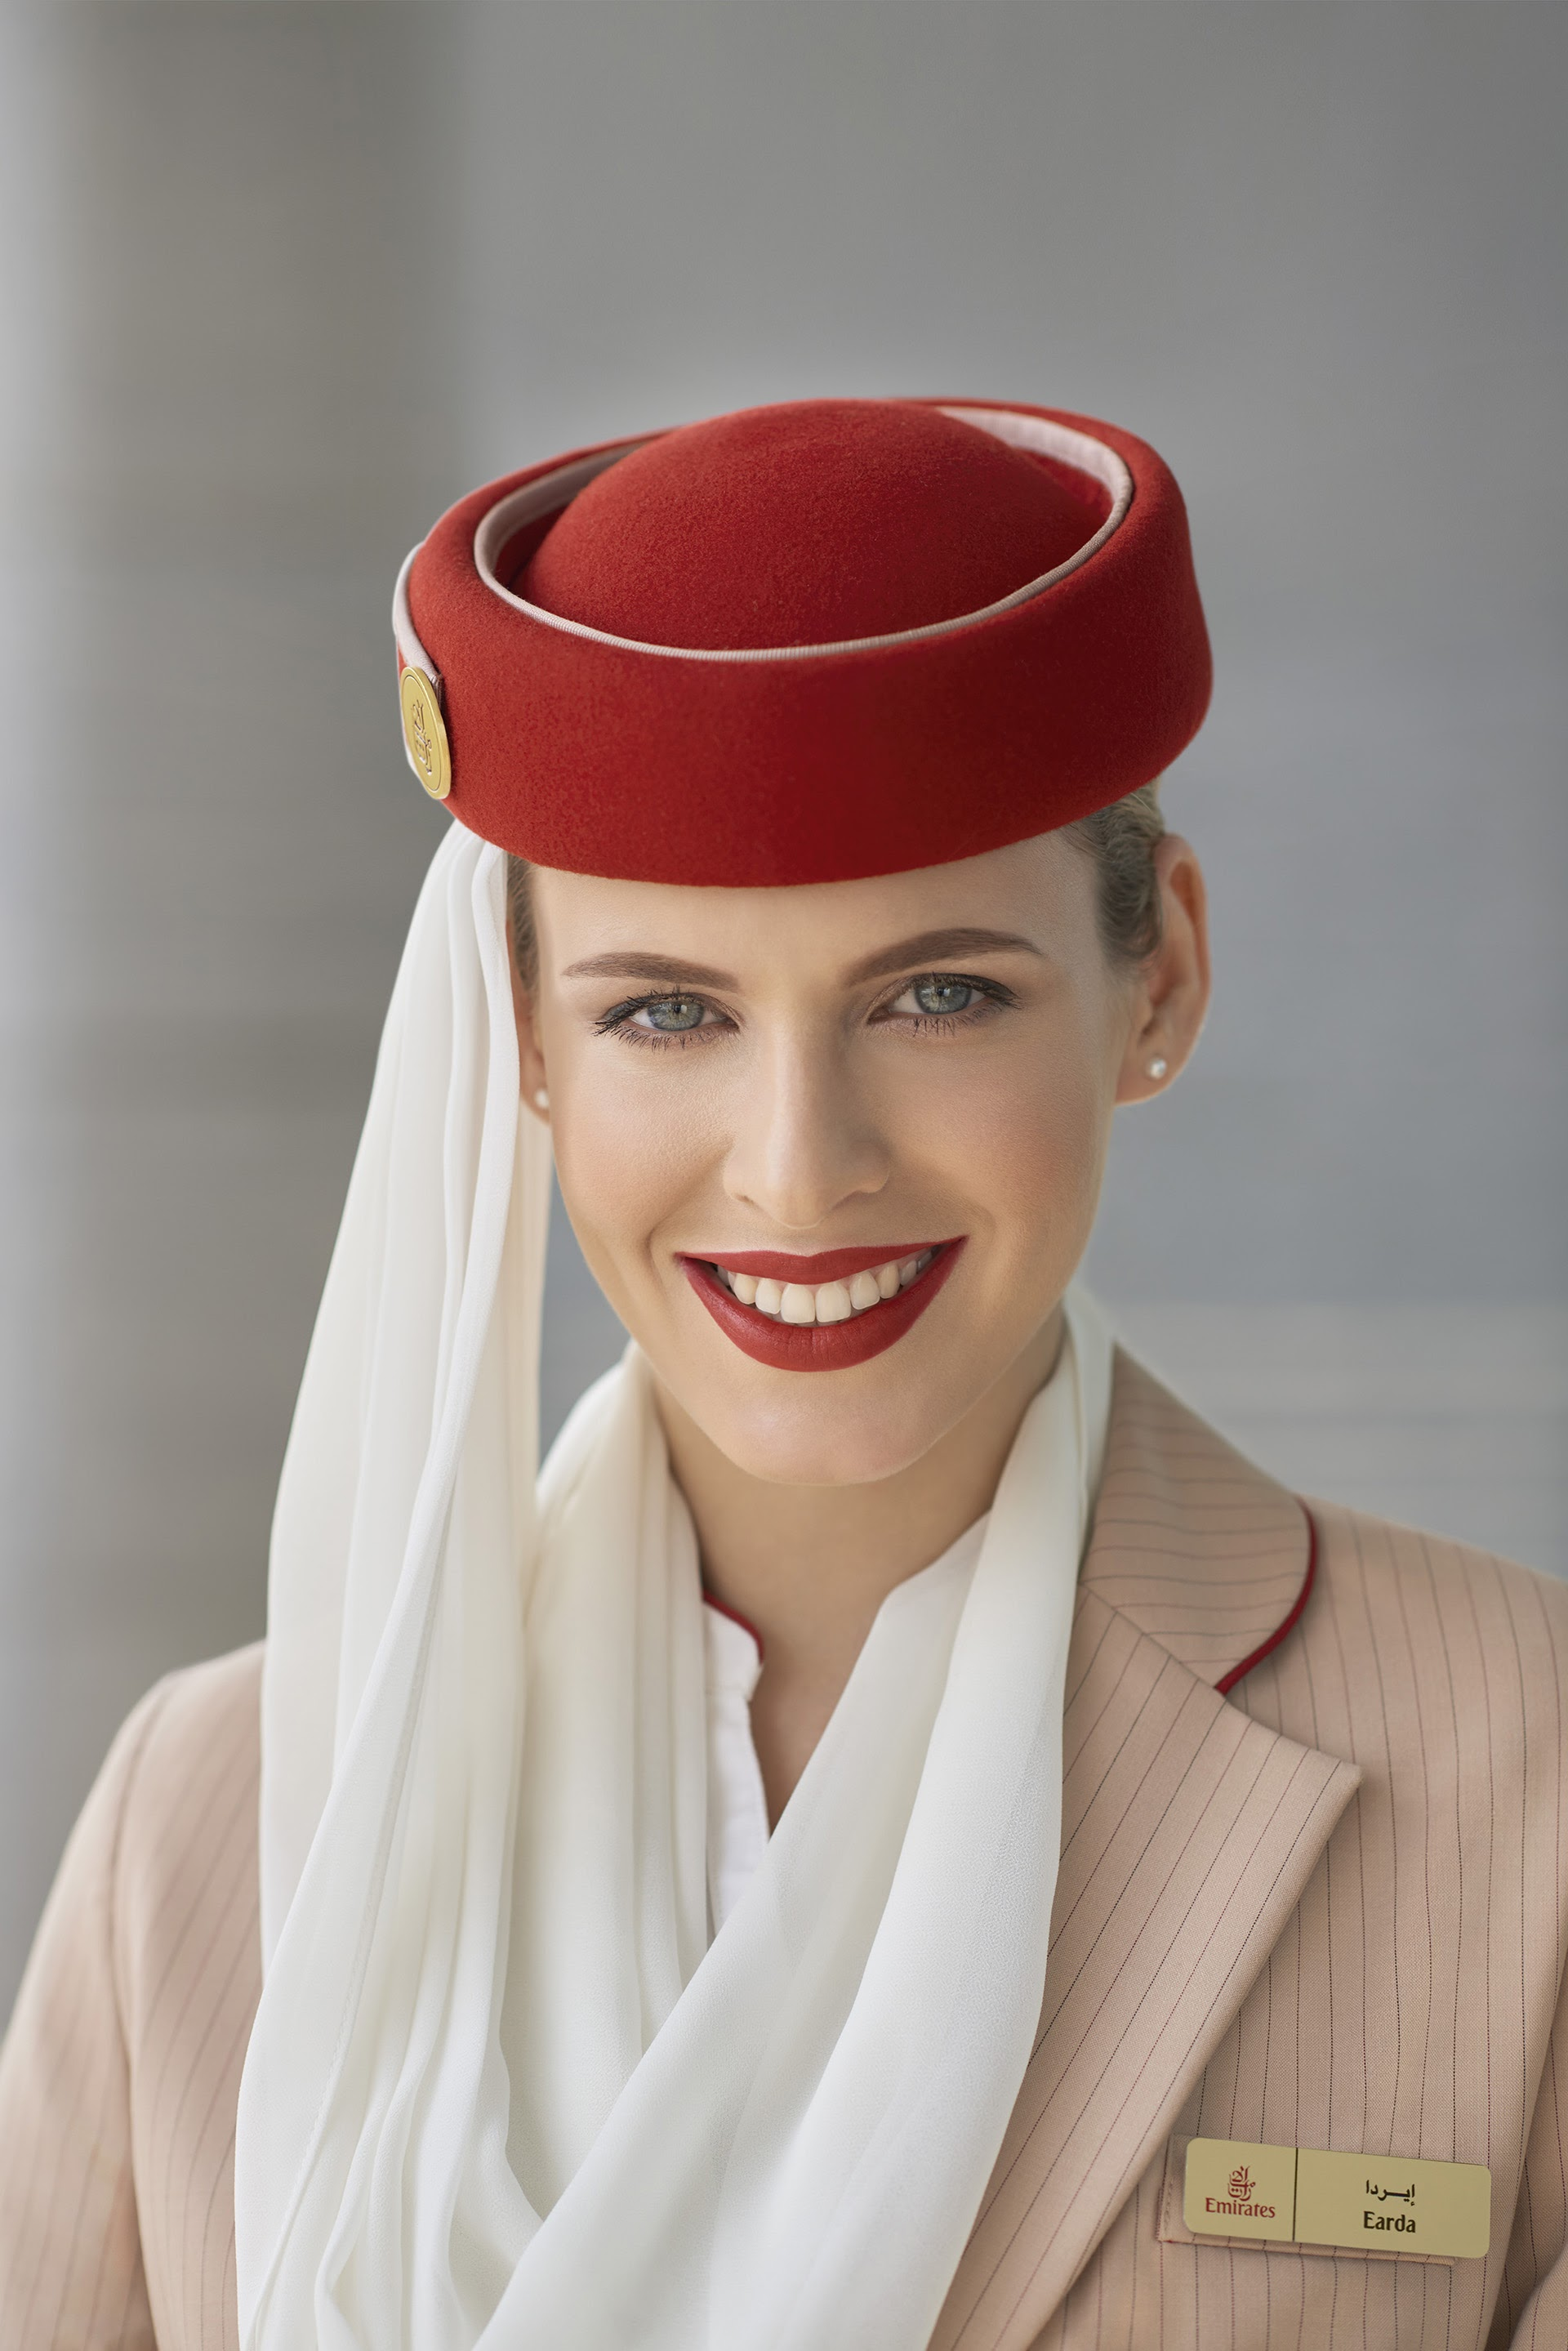 17-02-22_Emirates_1095_WORK.jpg